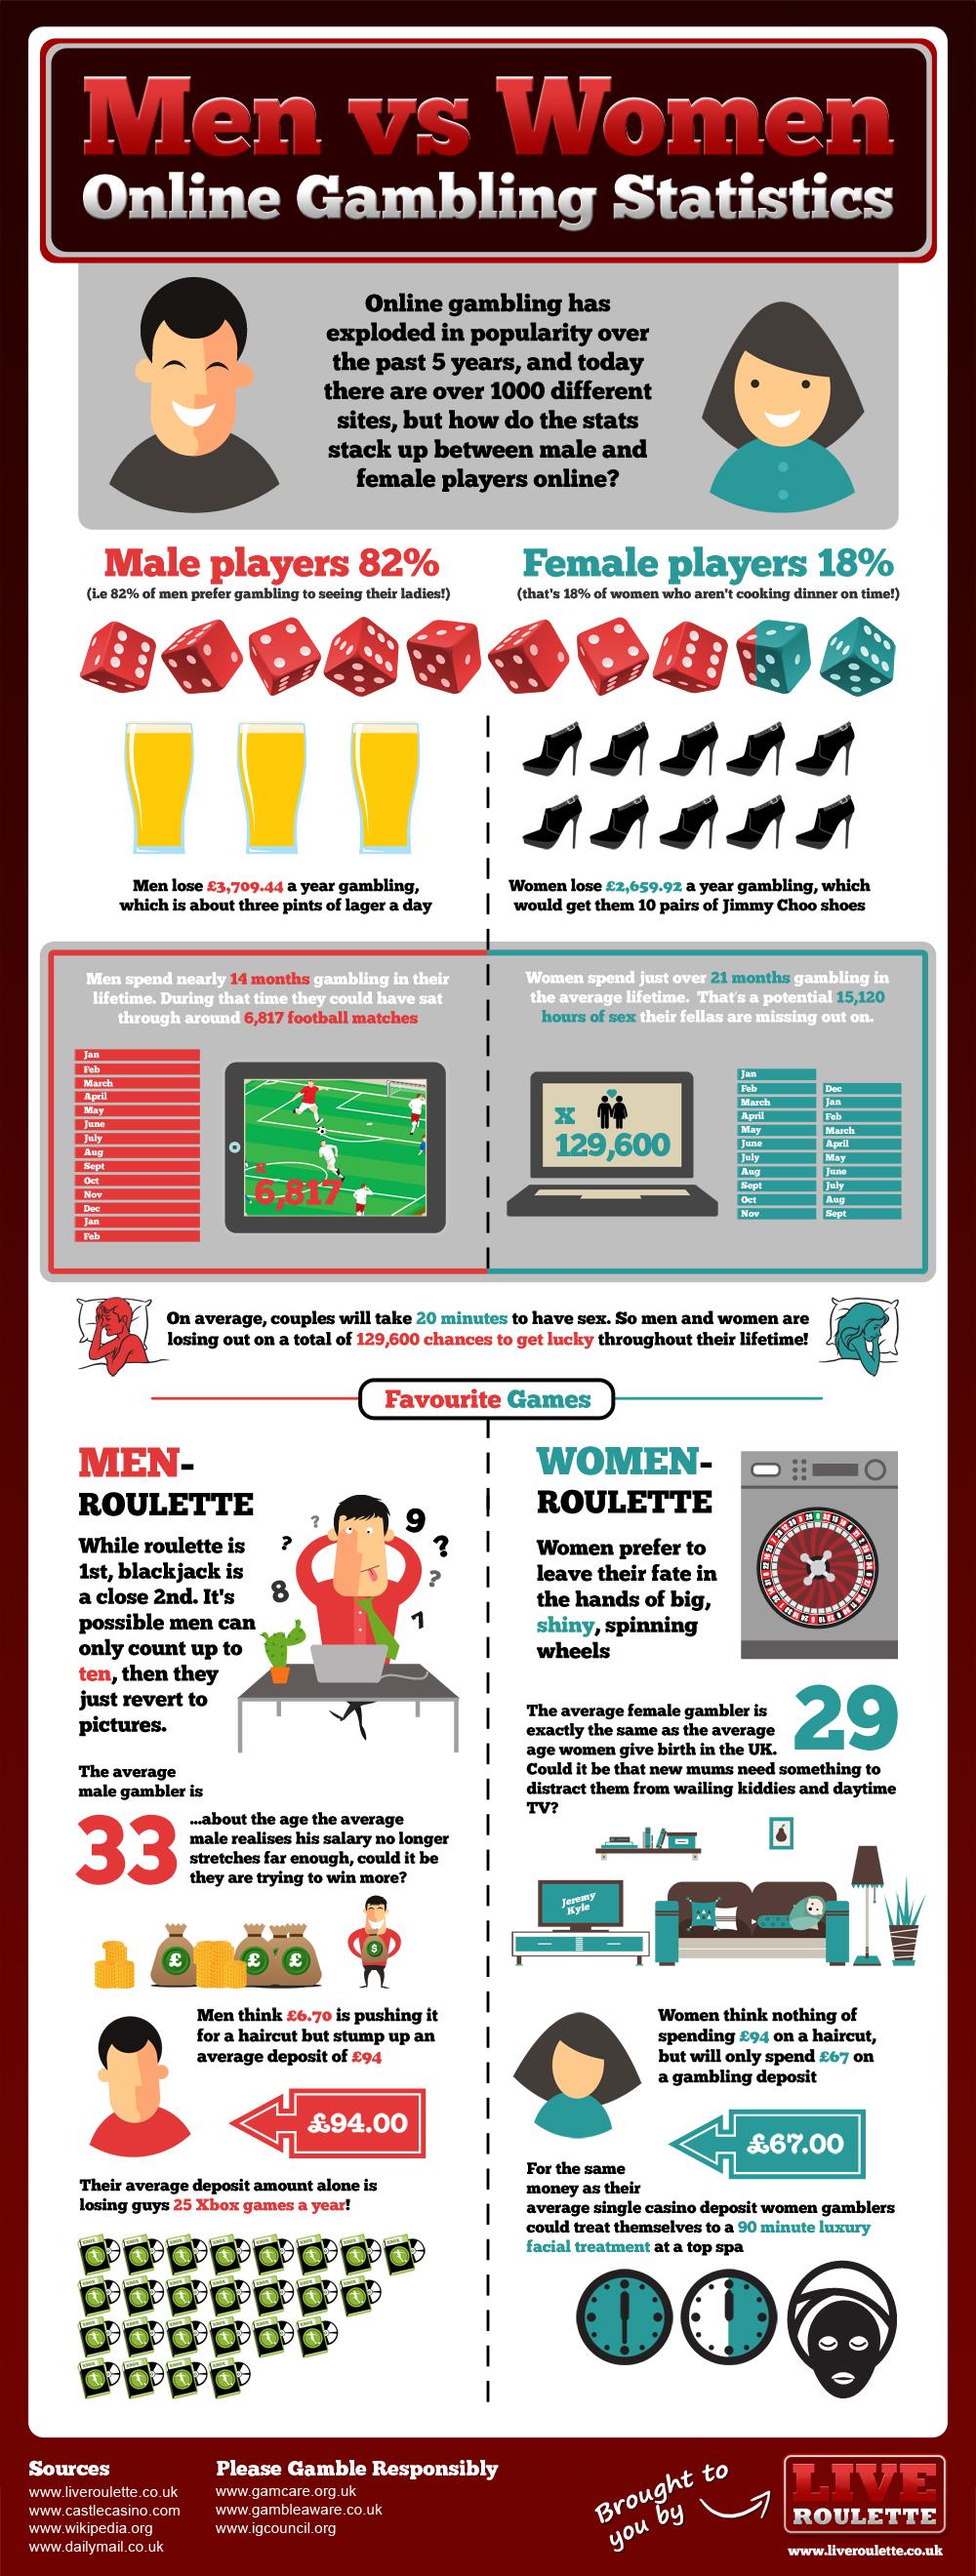 men-vs-women-online-gambling-statistics_5035056f3fb81